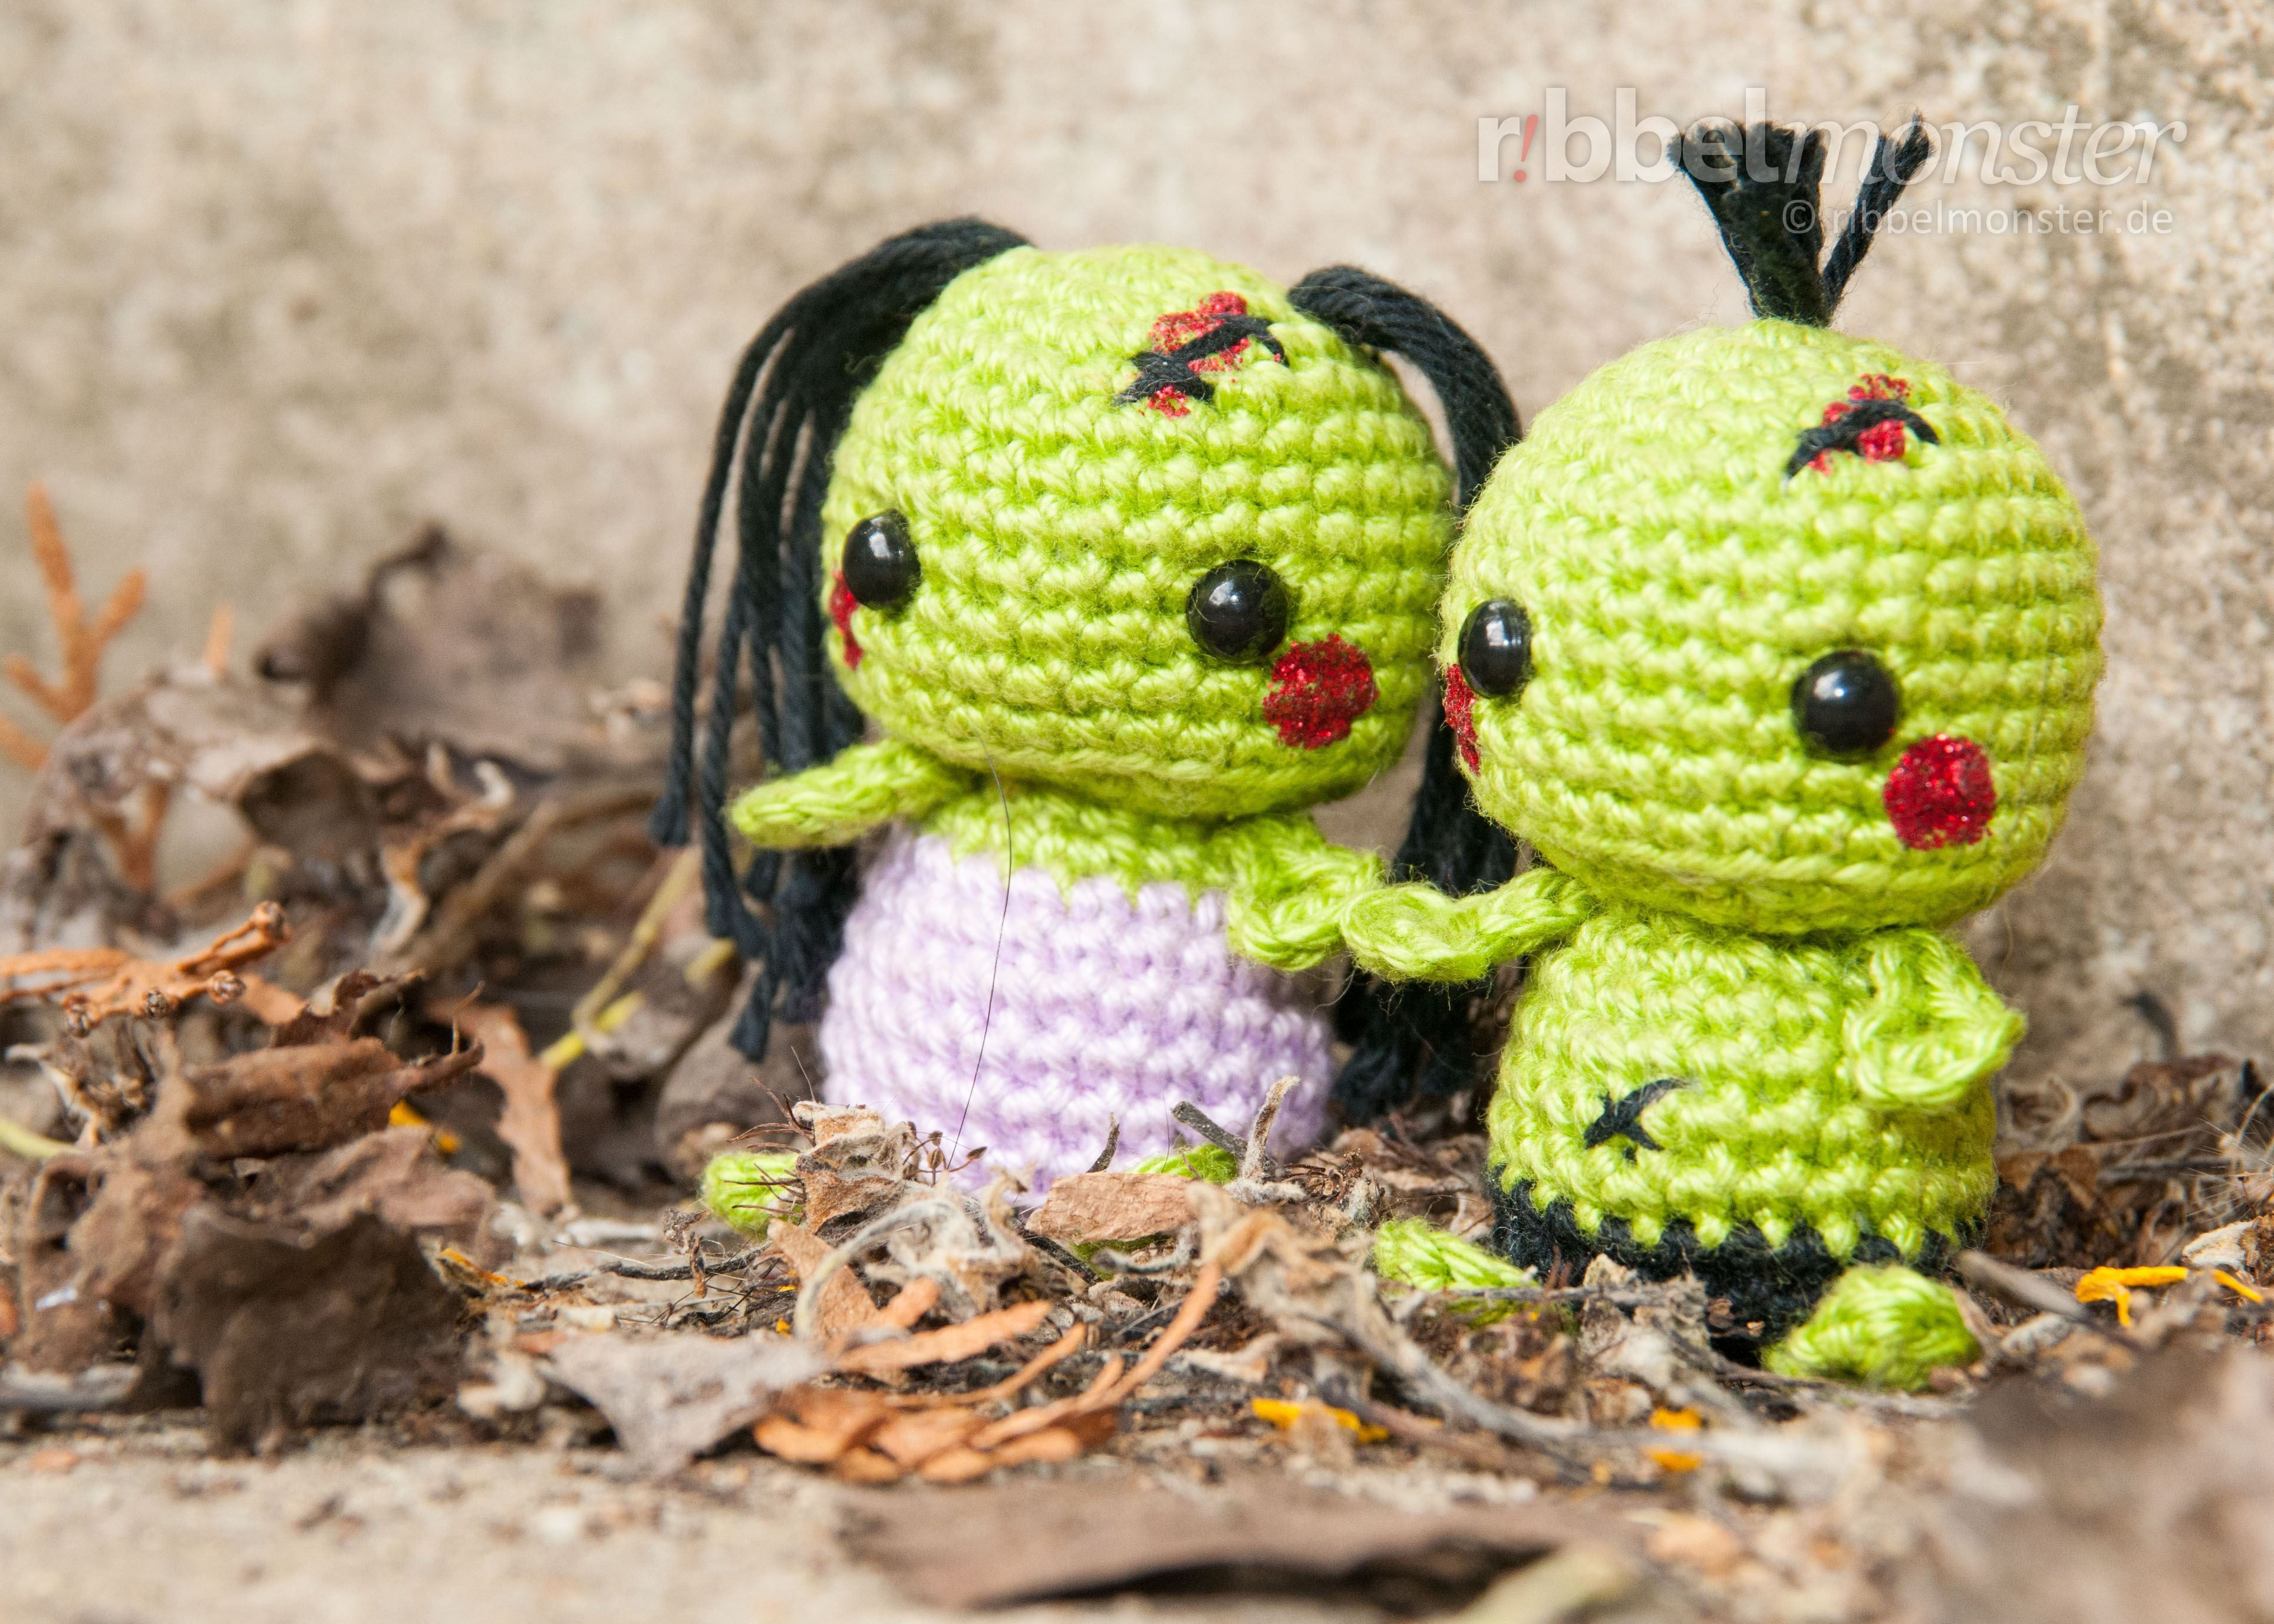 Amigurumi Monster Anleitung Kostenlos : Anleitung amigurumi minimee zombies häkeln kostenlose